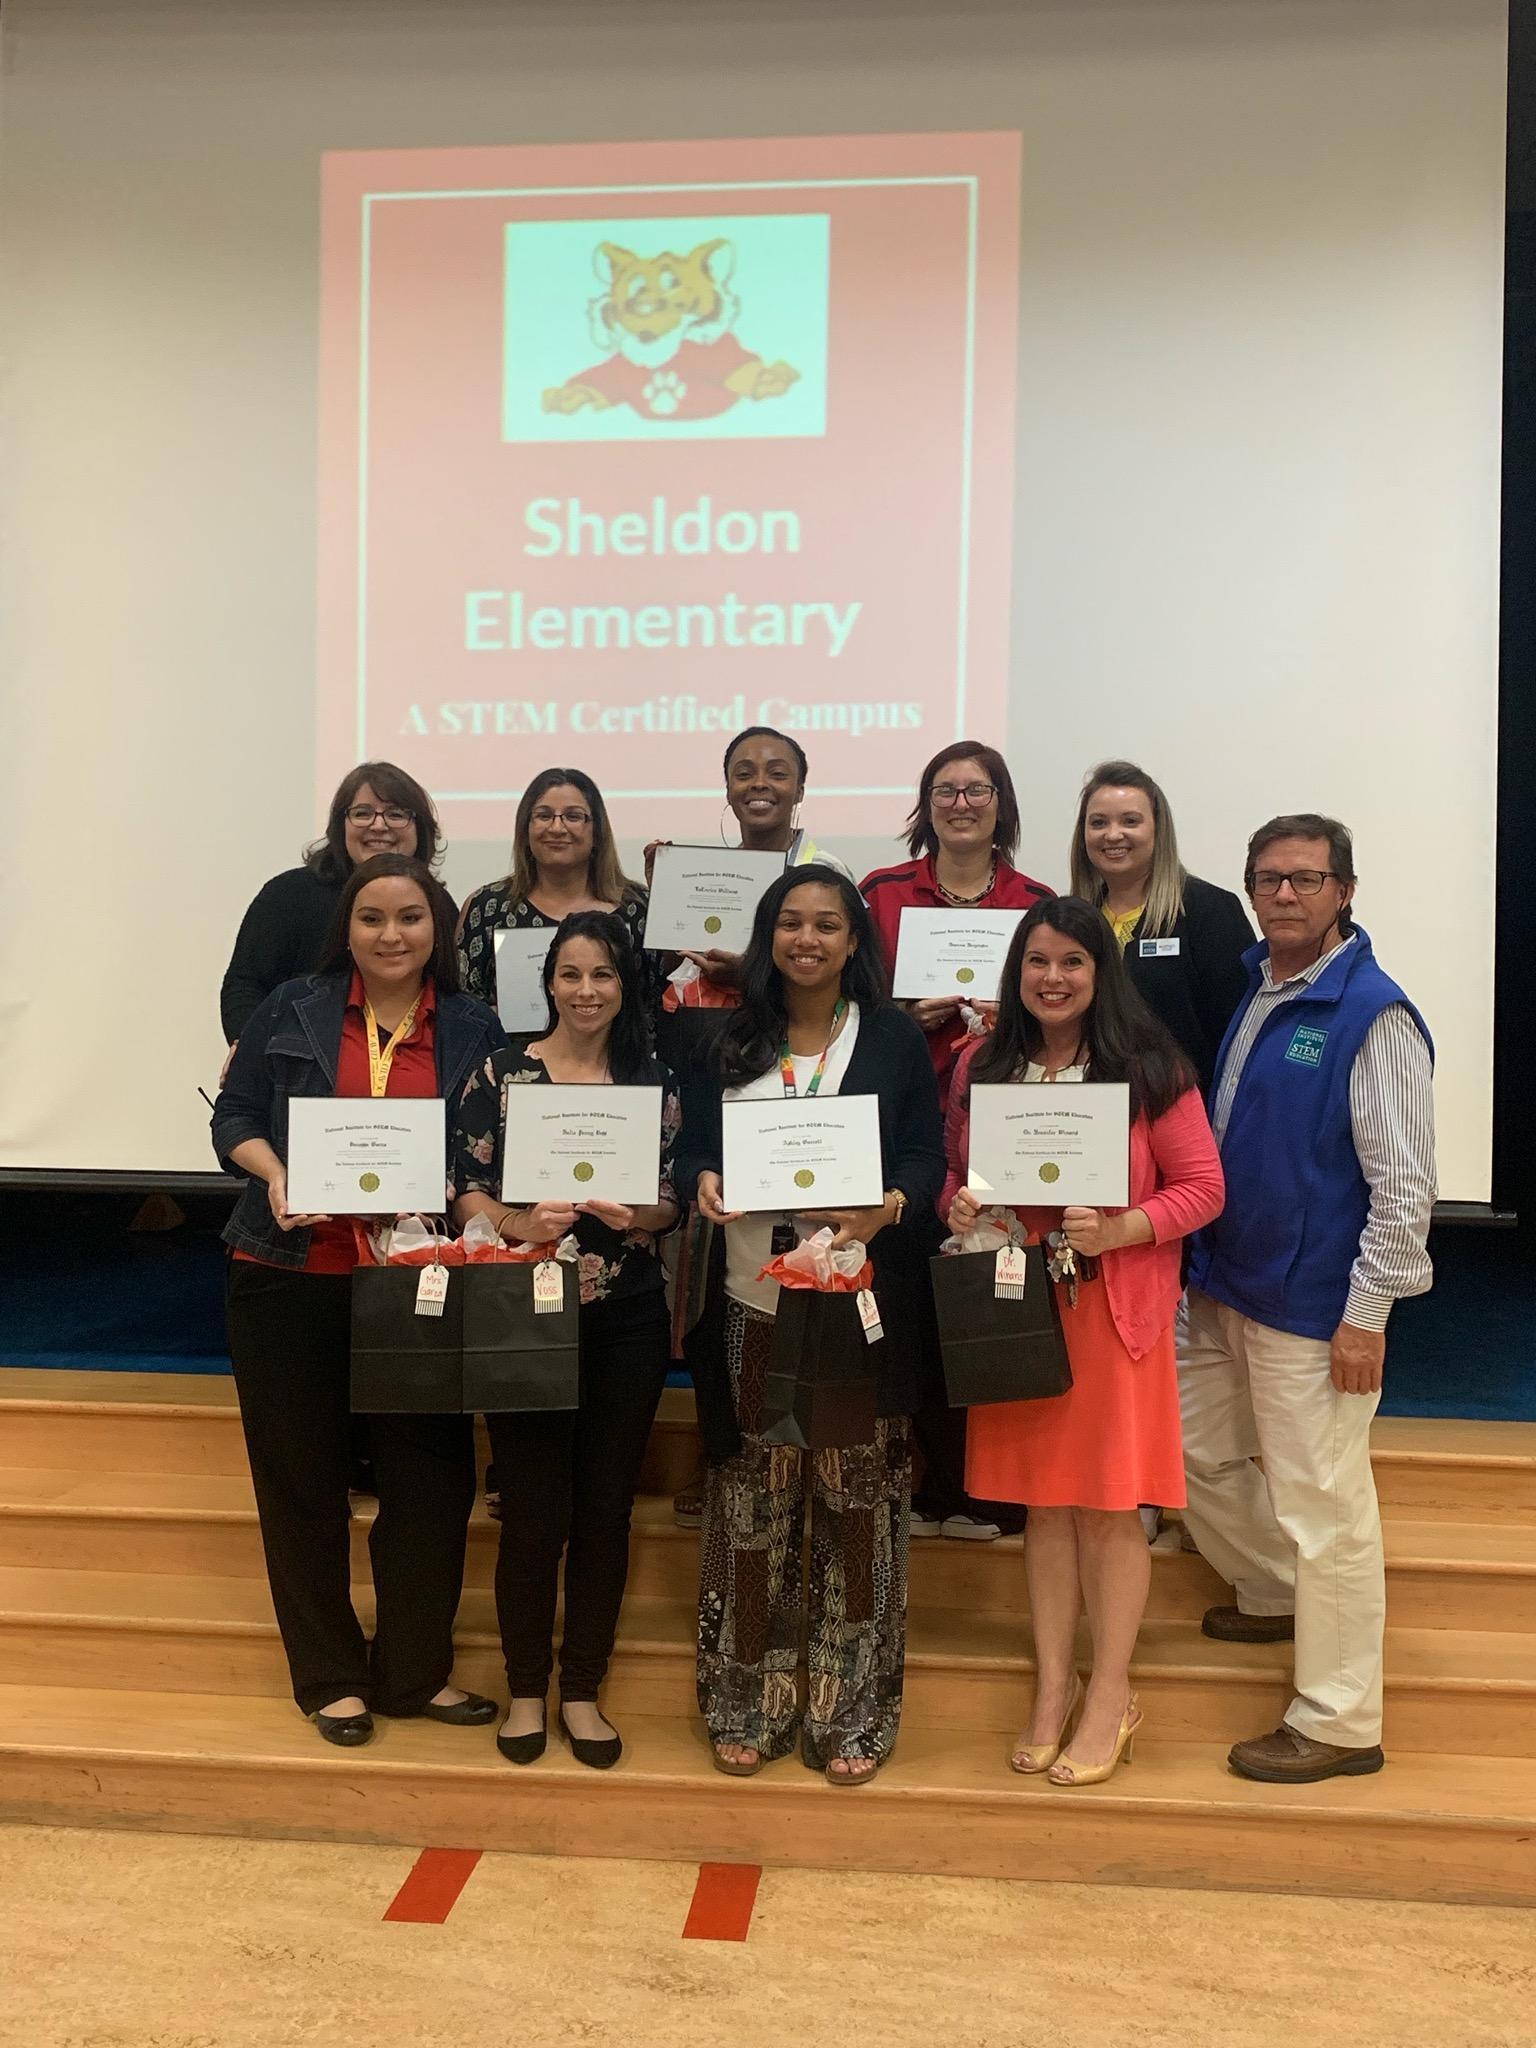 Sheldon Elementary School Spotlight Image